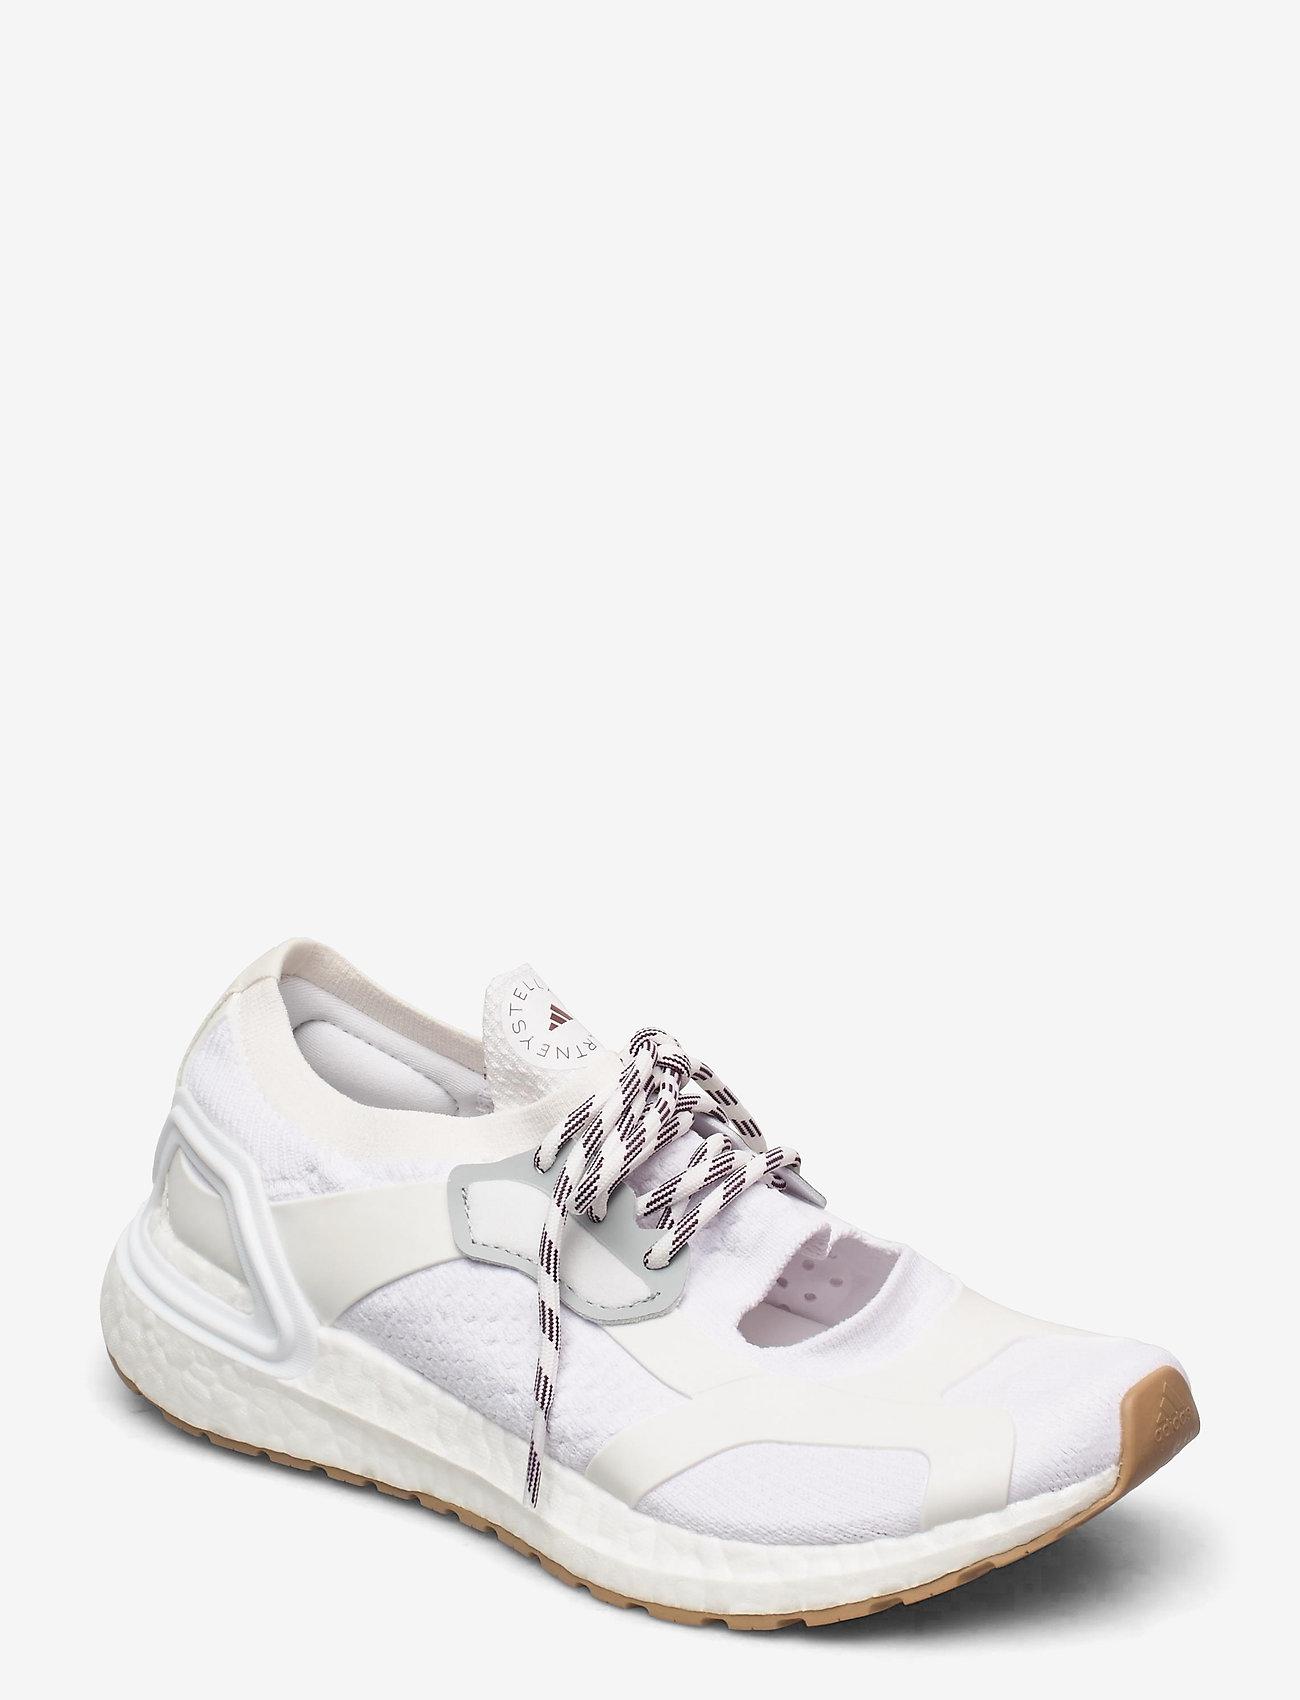 adidas by Stella McCartney - Ultraboost Sandals W - training schoenen - ftwwht/owhite/clowhi - 1